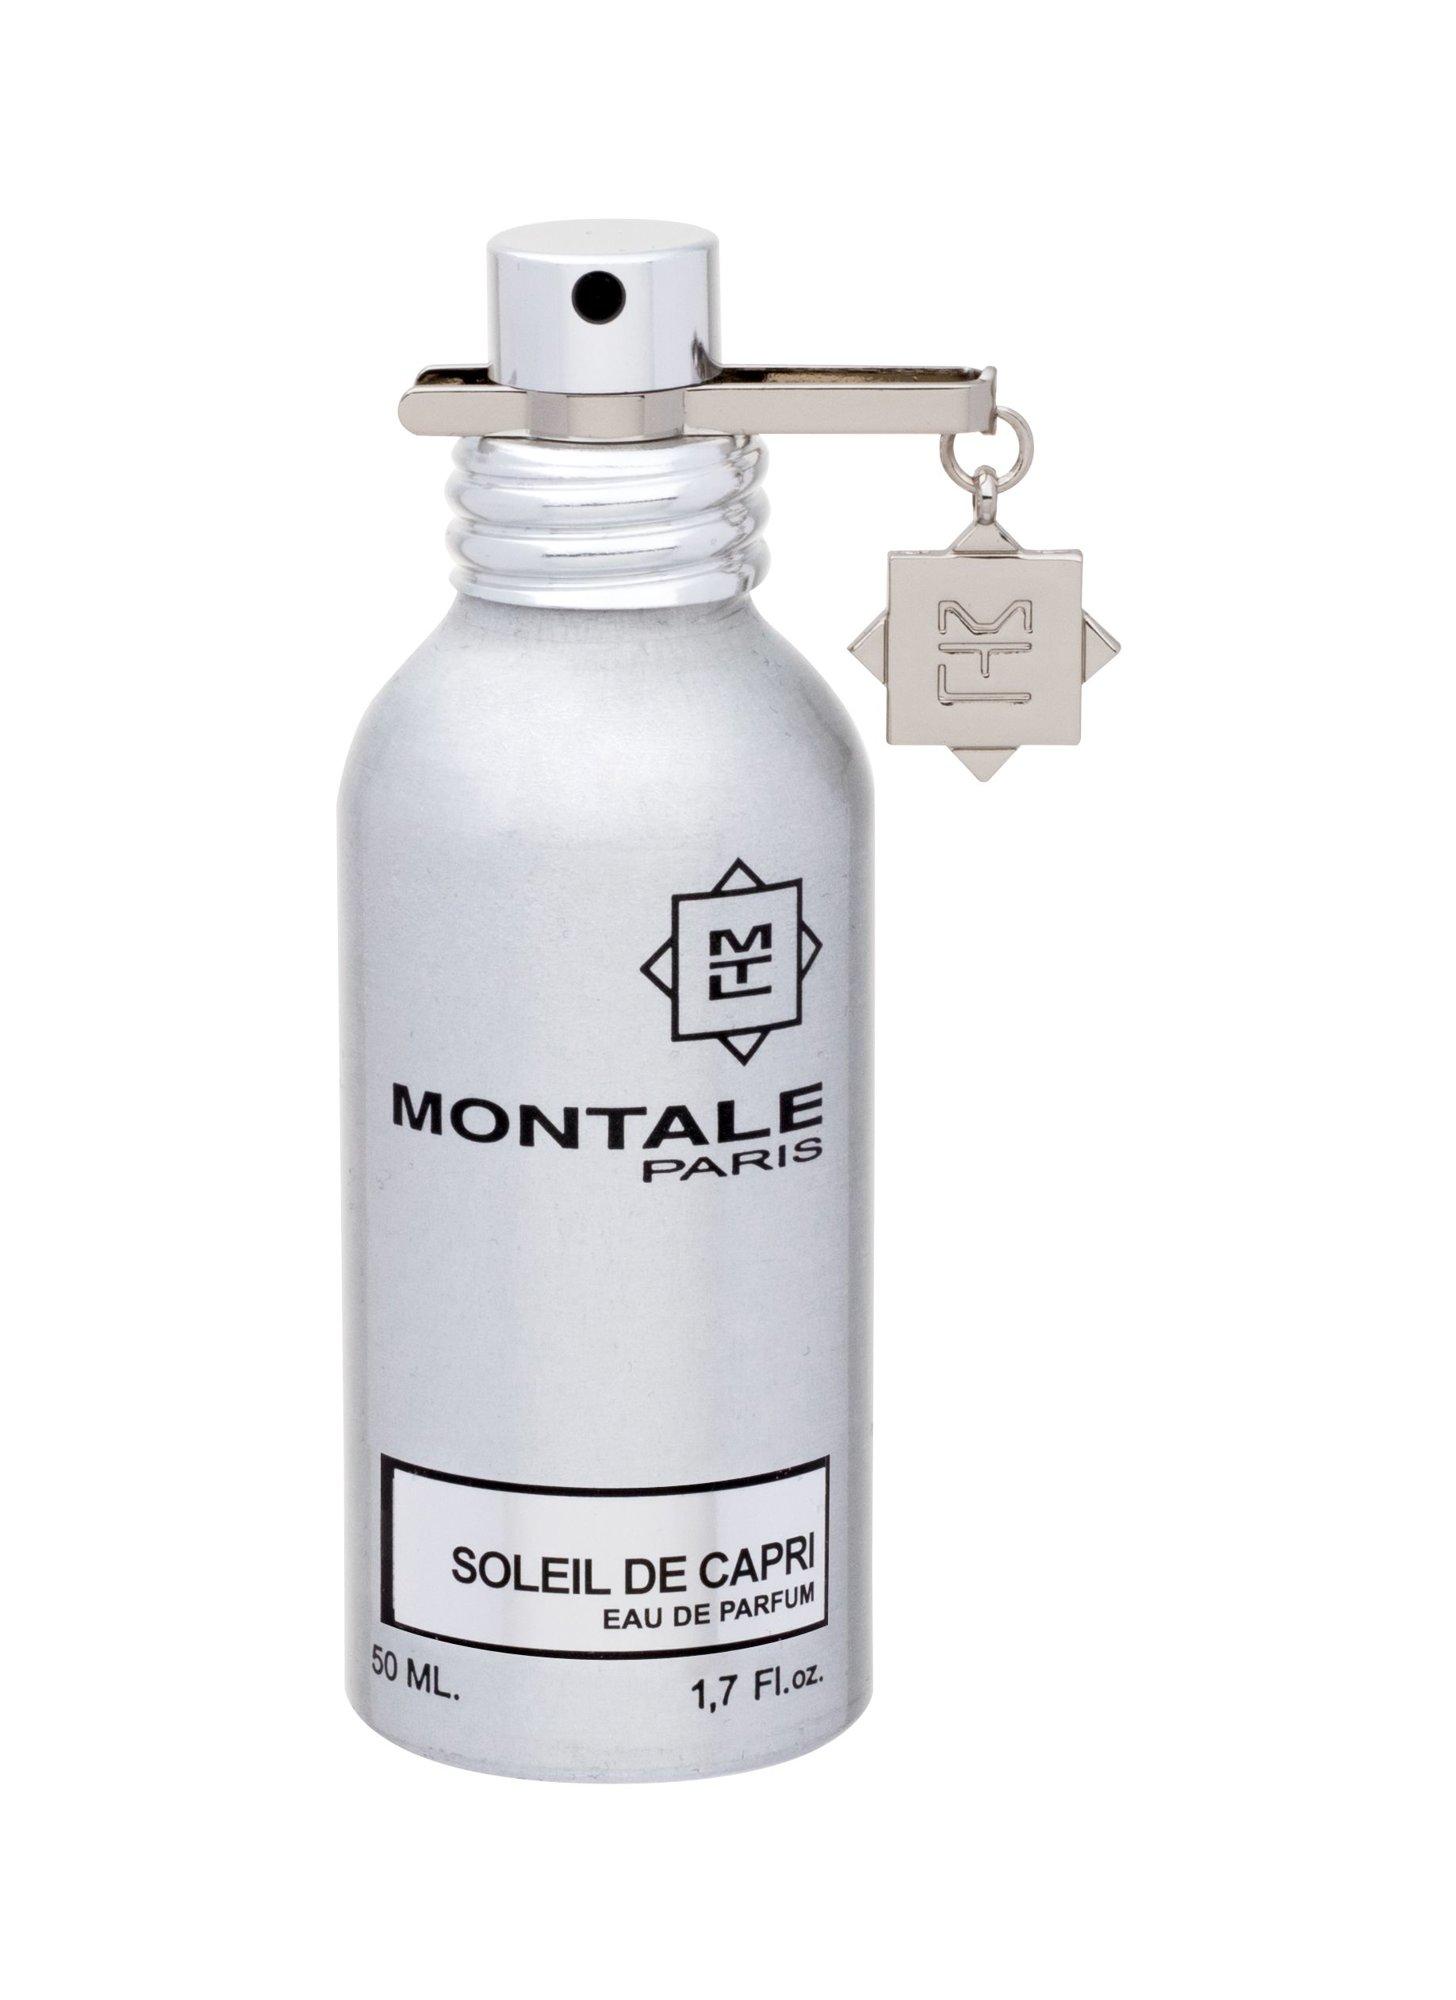 Montale Paris Soleil De Capri EDP 50ml